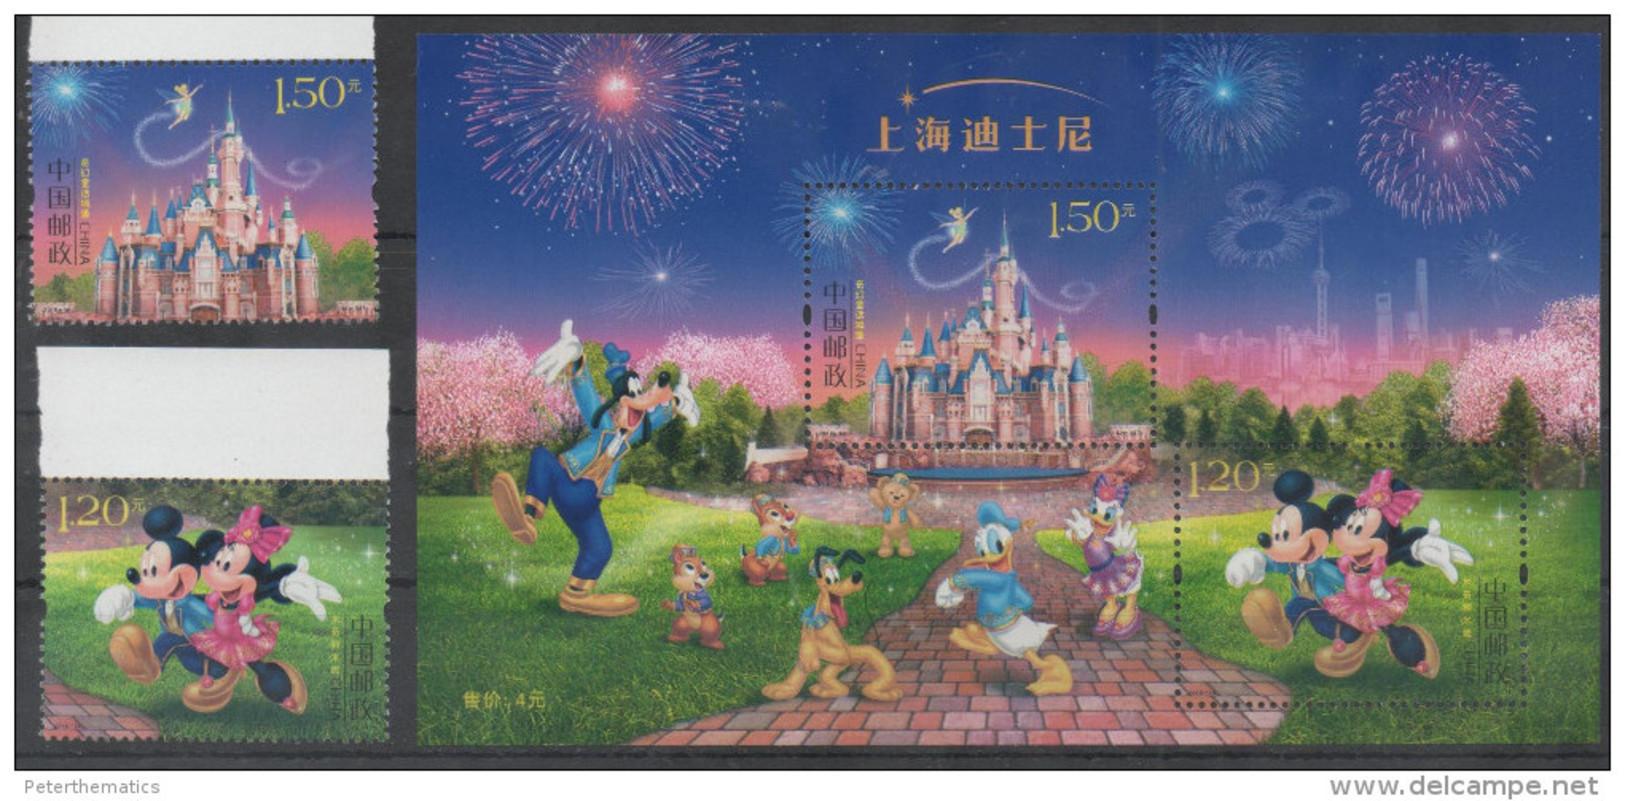 CHINA, 2016, MNH,SHANGHAI DISNEYLAND, DISNEY, FIREWEORKS,MICKEY MOUSE, DONALD DUCK, GOOFY, PLUTO, 2v+S/SHEET - Disney